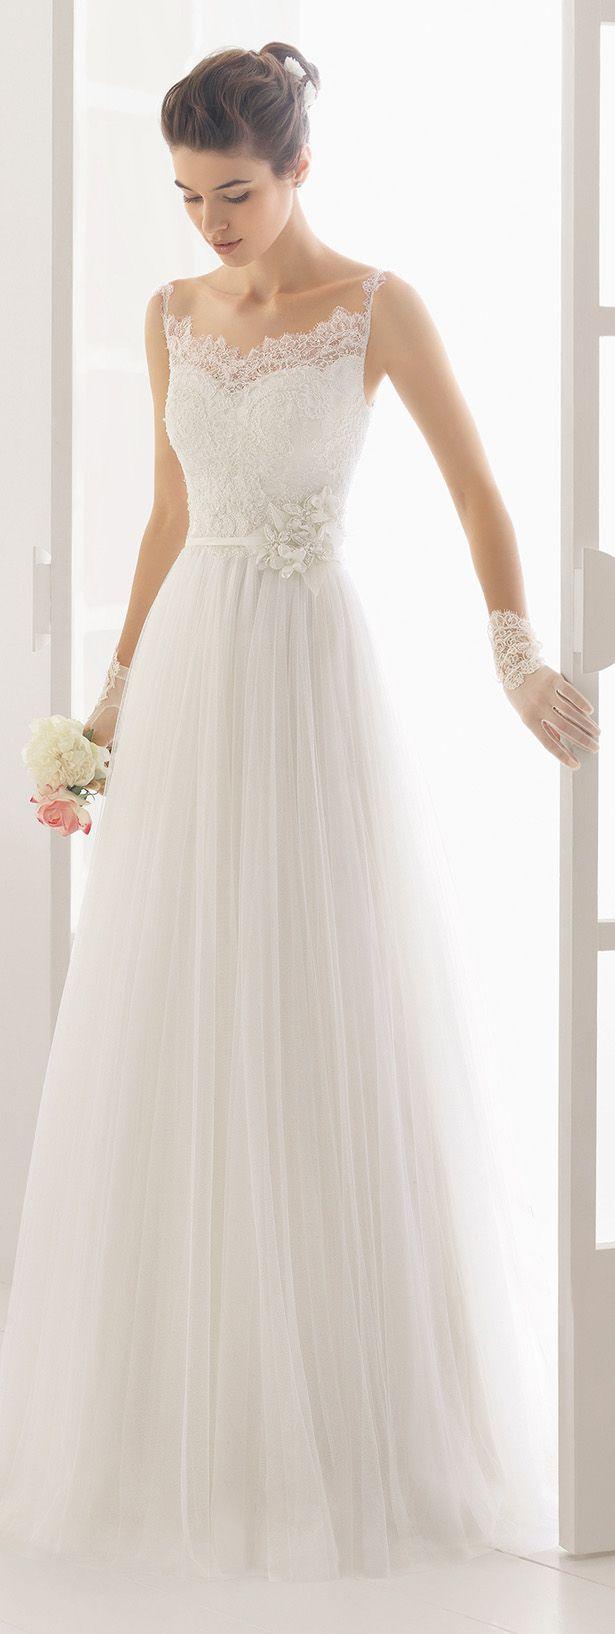 aire barcelona wedding dresses wedding dress com Best Wedding Dresses of